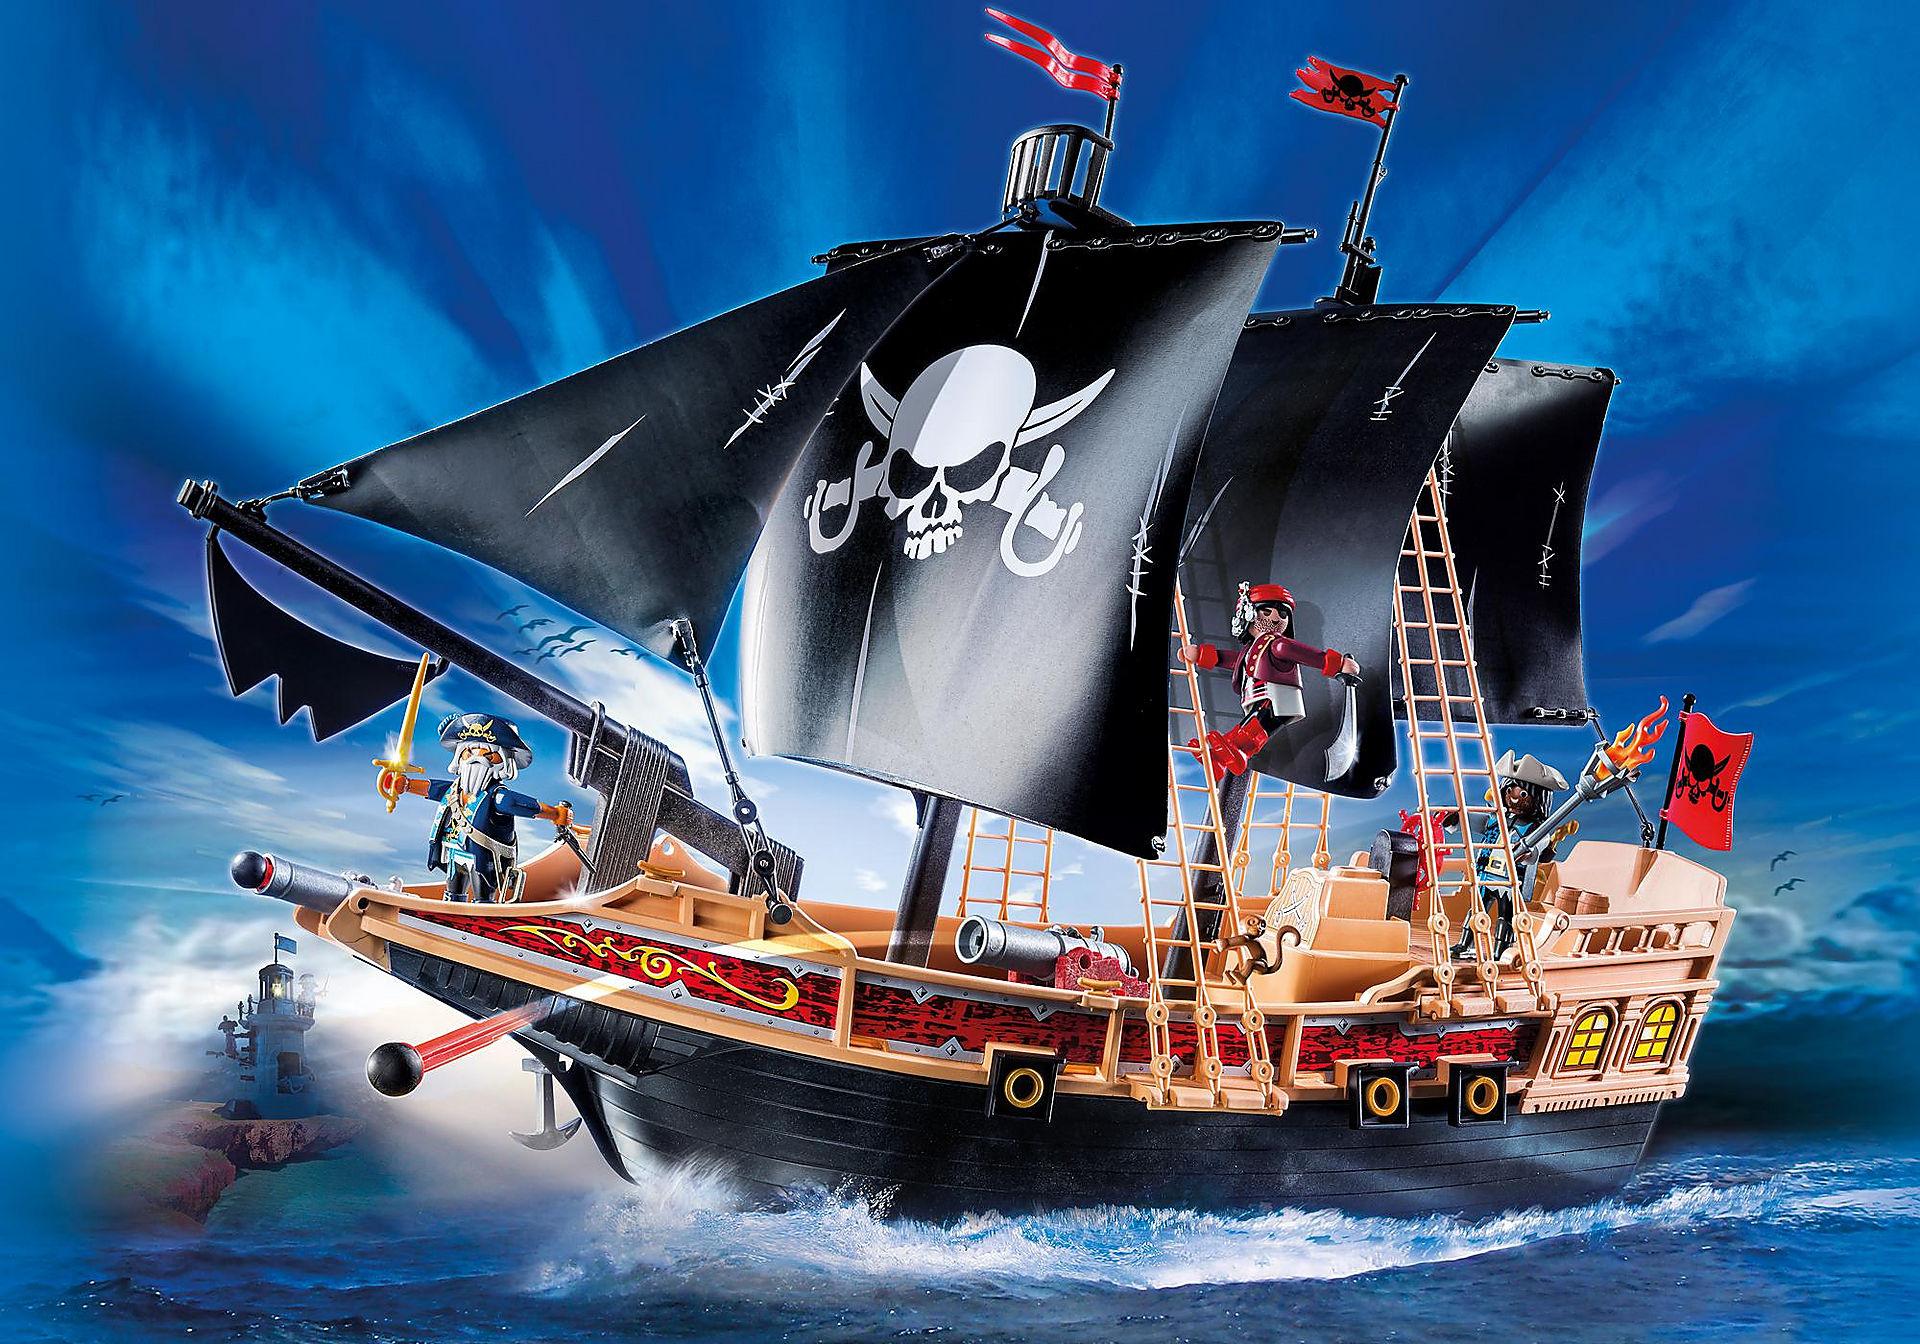 http://media.playmobil.com/i/playmobil/6678_product_detail/Pirate Raiders' Ship